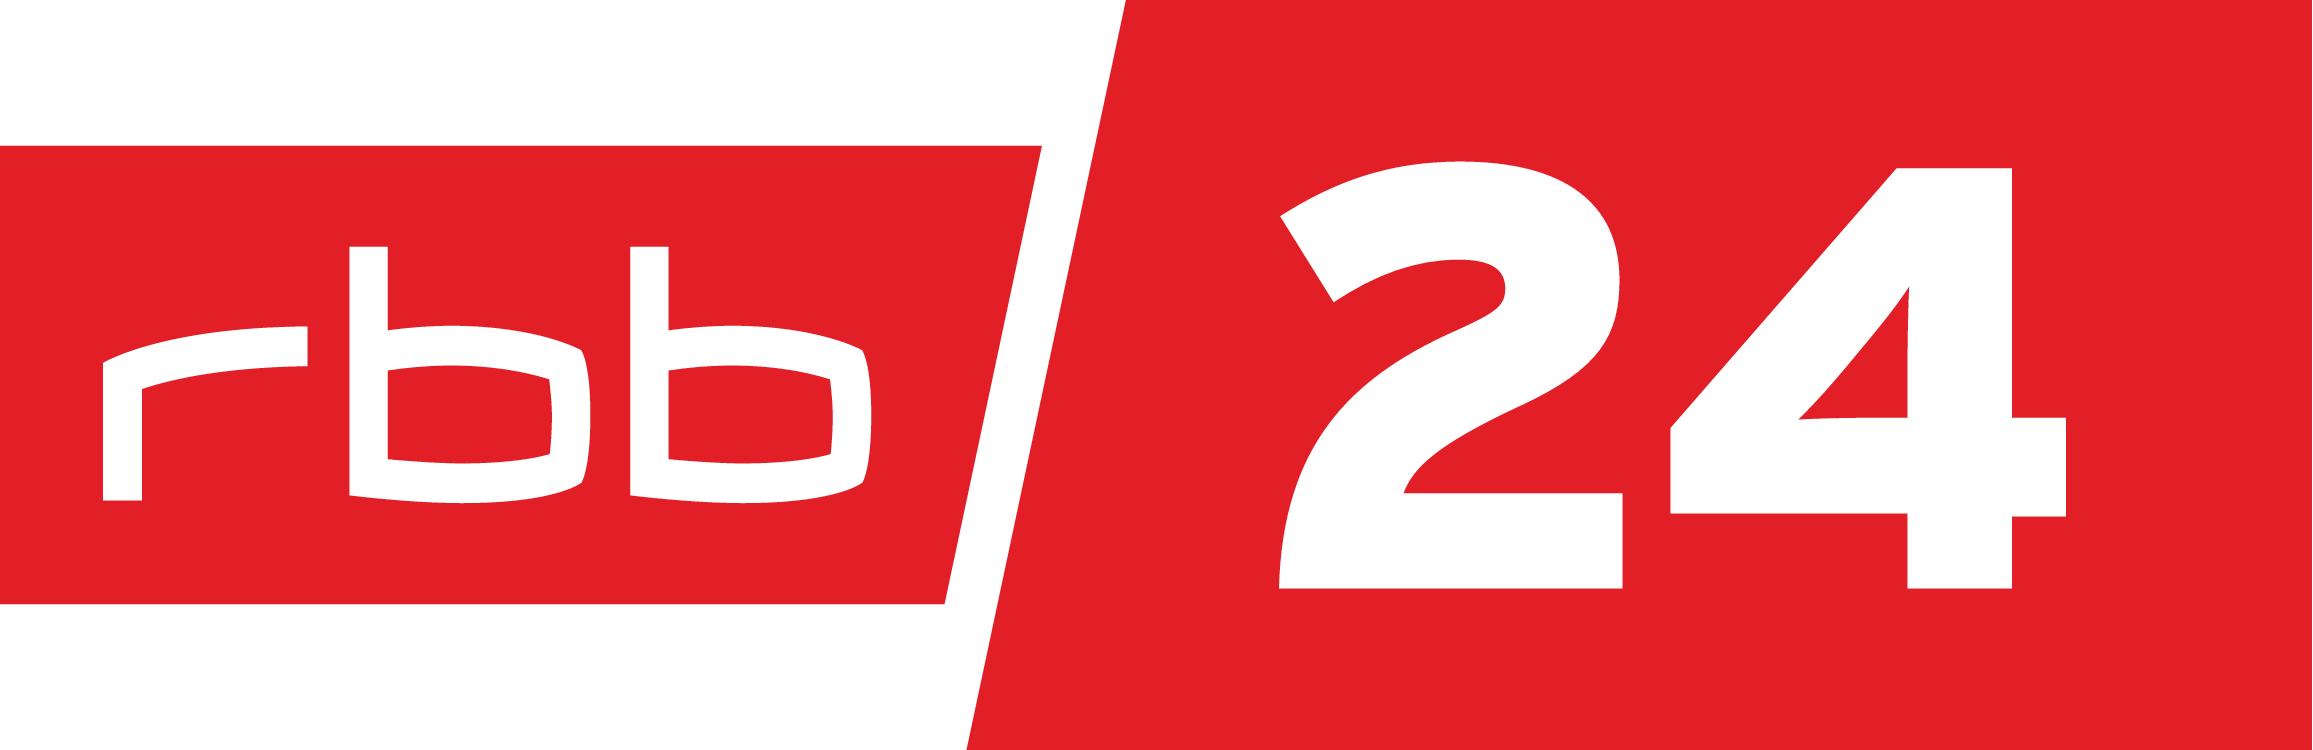 RBB (mit Logo)